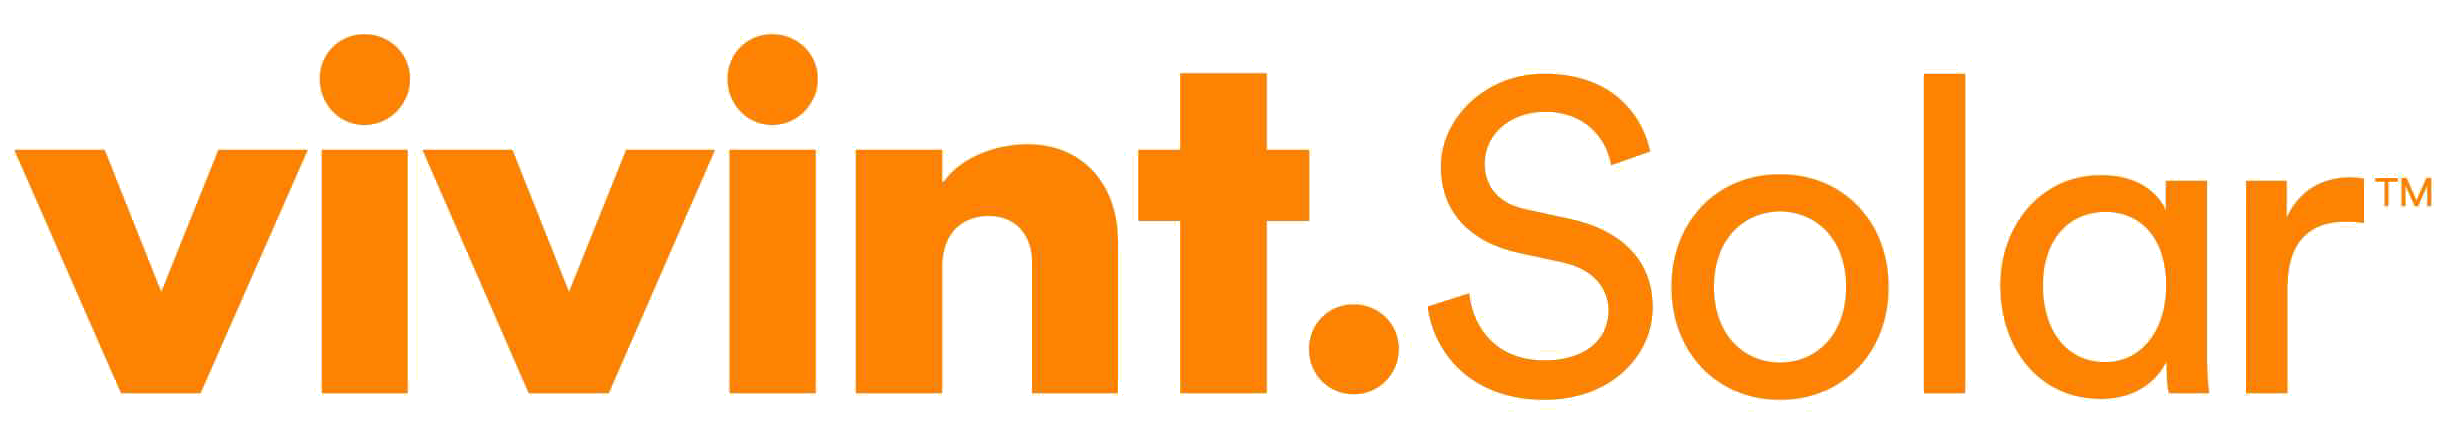 VivintSolar logo